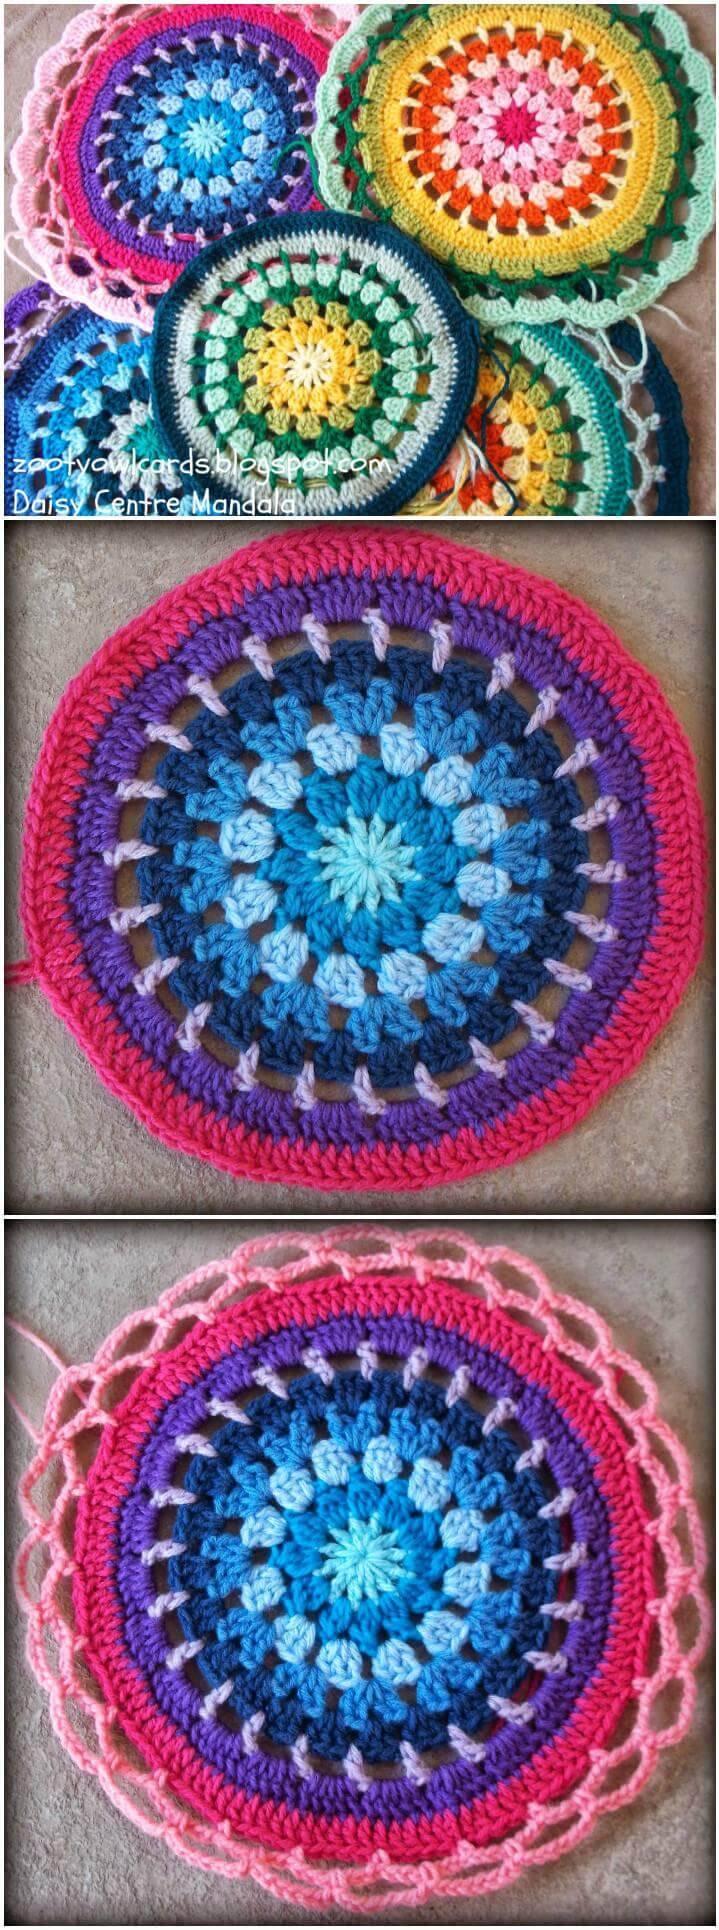 free crochet daisy centre mandala pattern